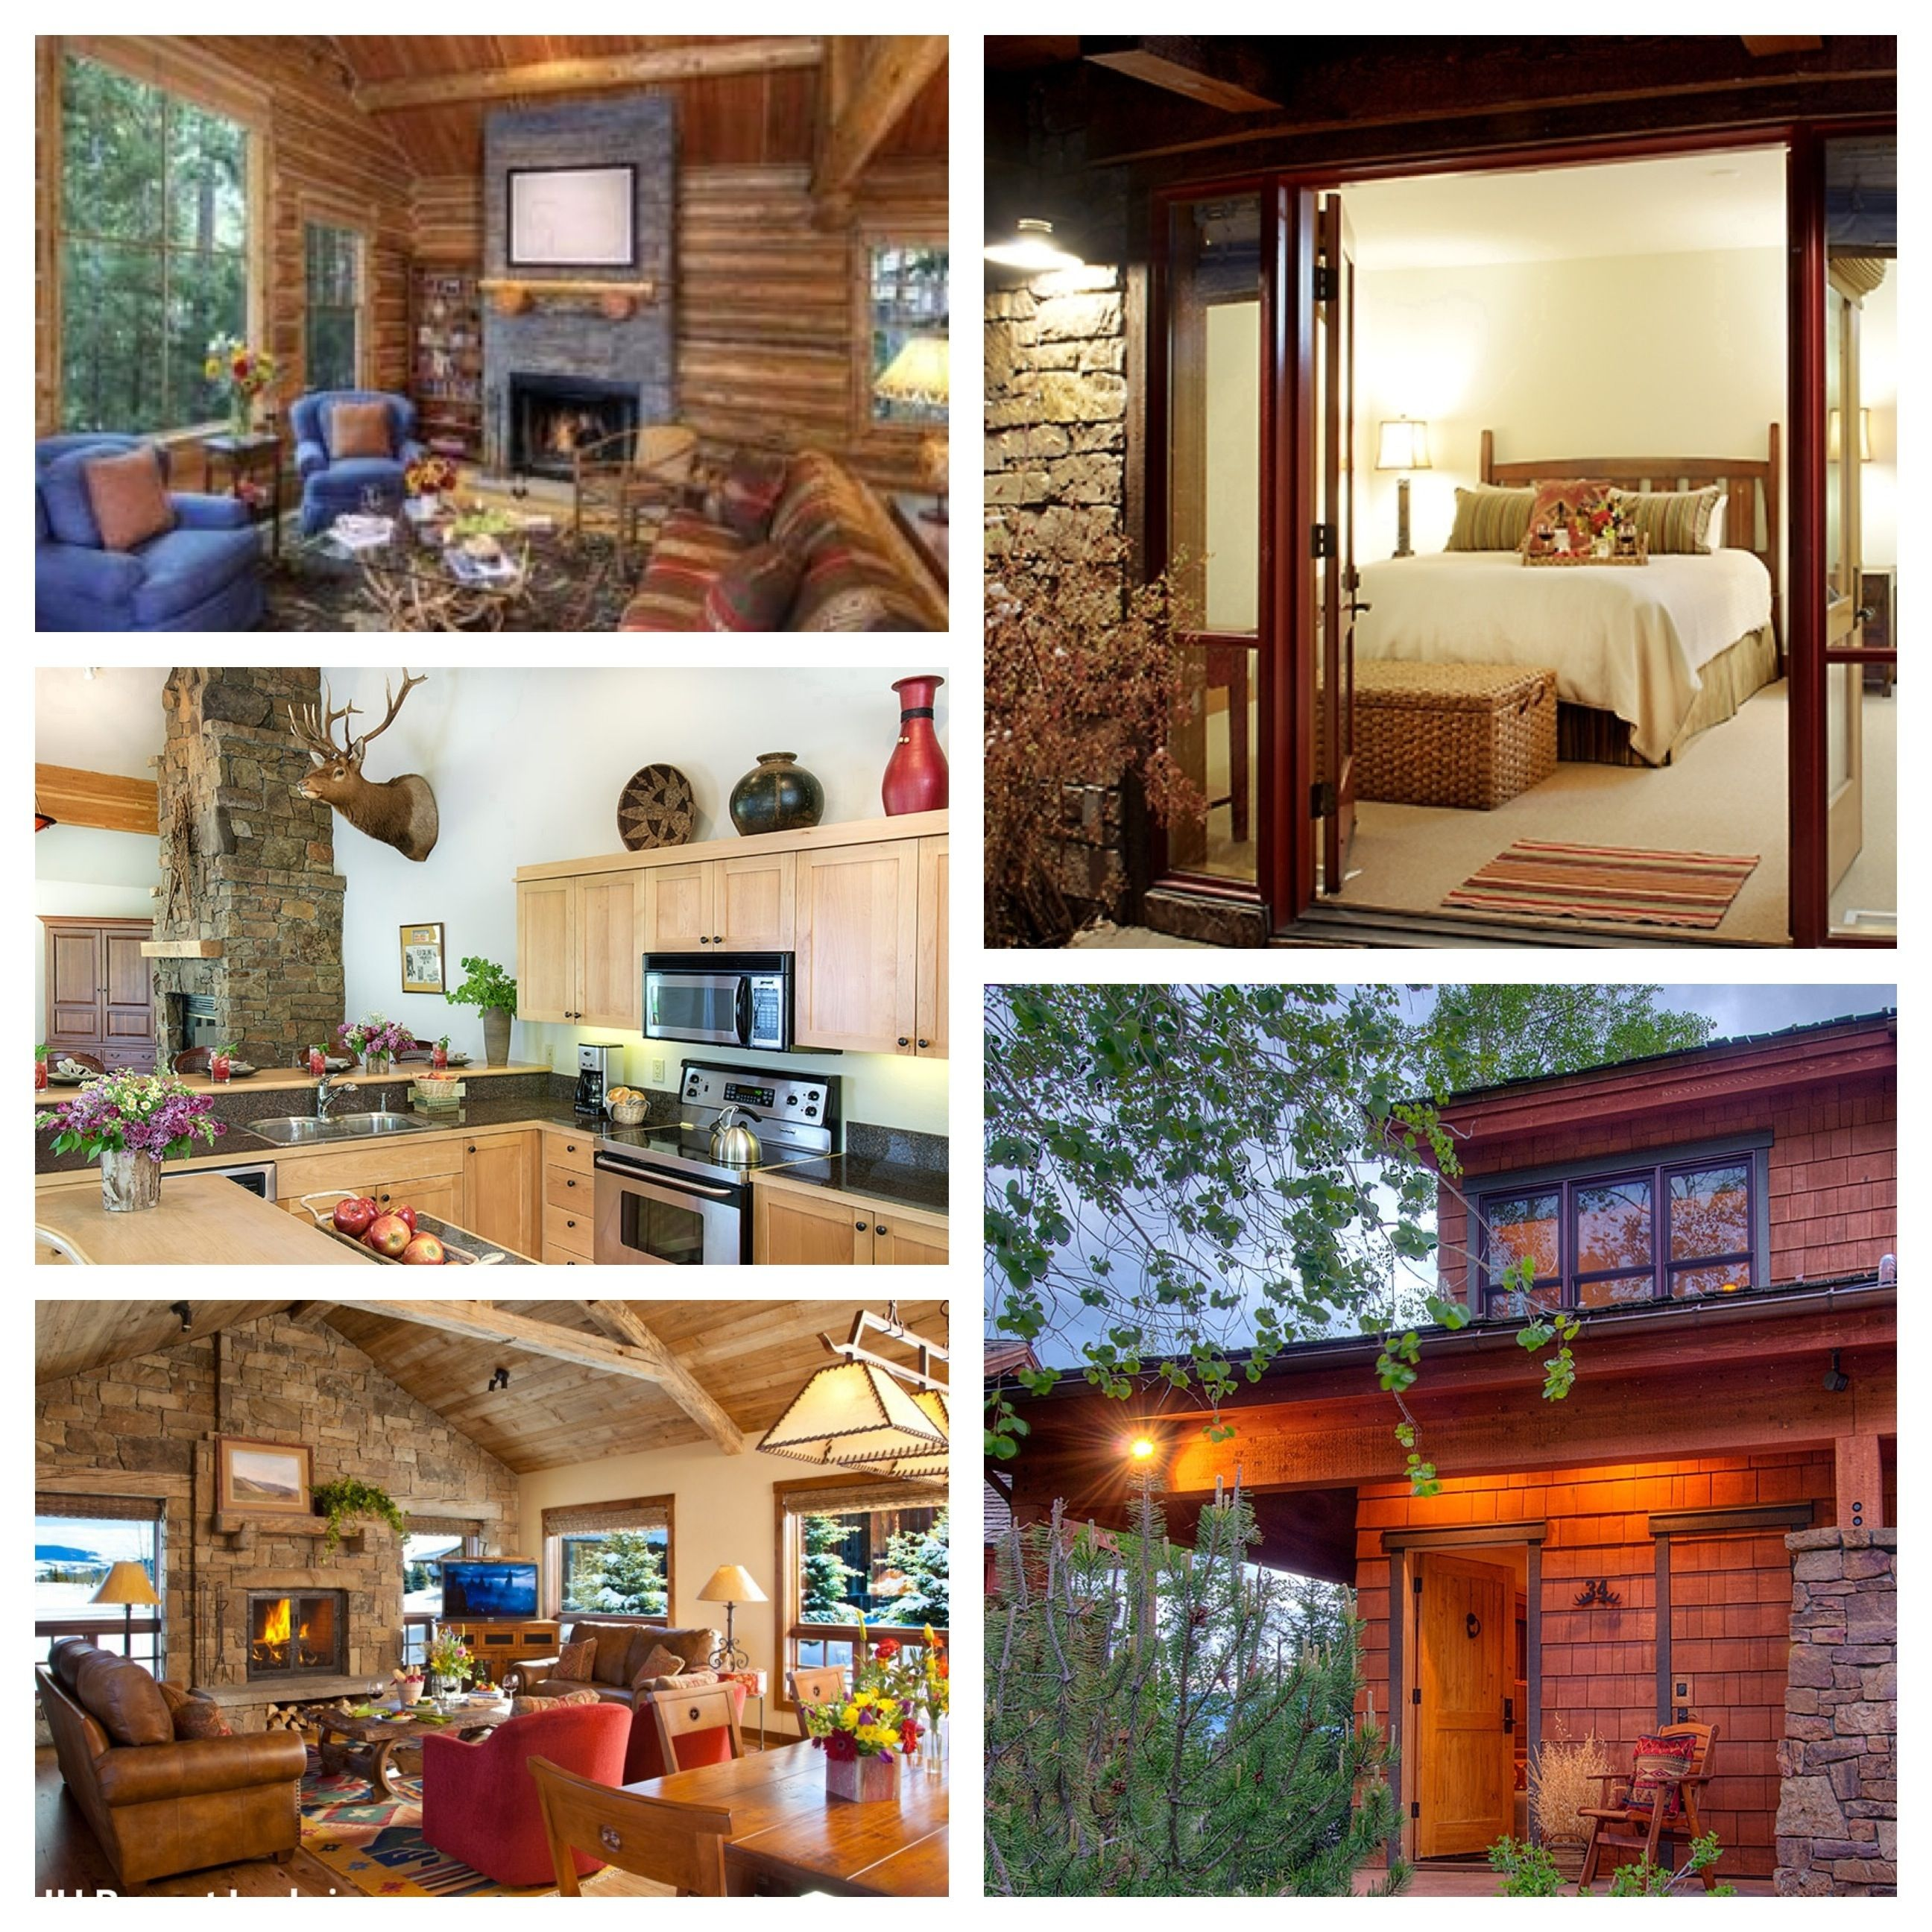 cabins cabin gatlinburg forge rentals hole wild rental jackson pigeon thing bedroom